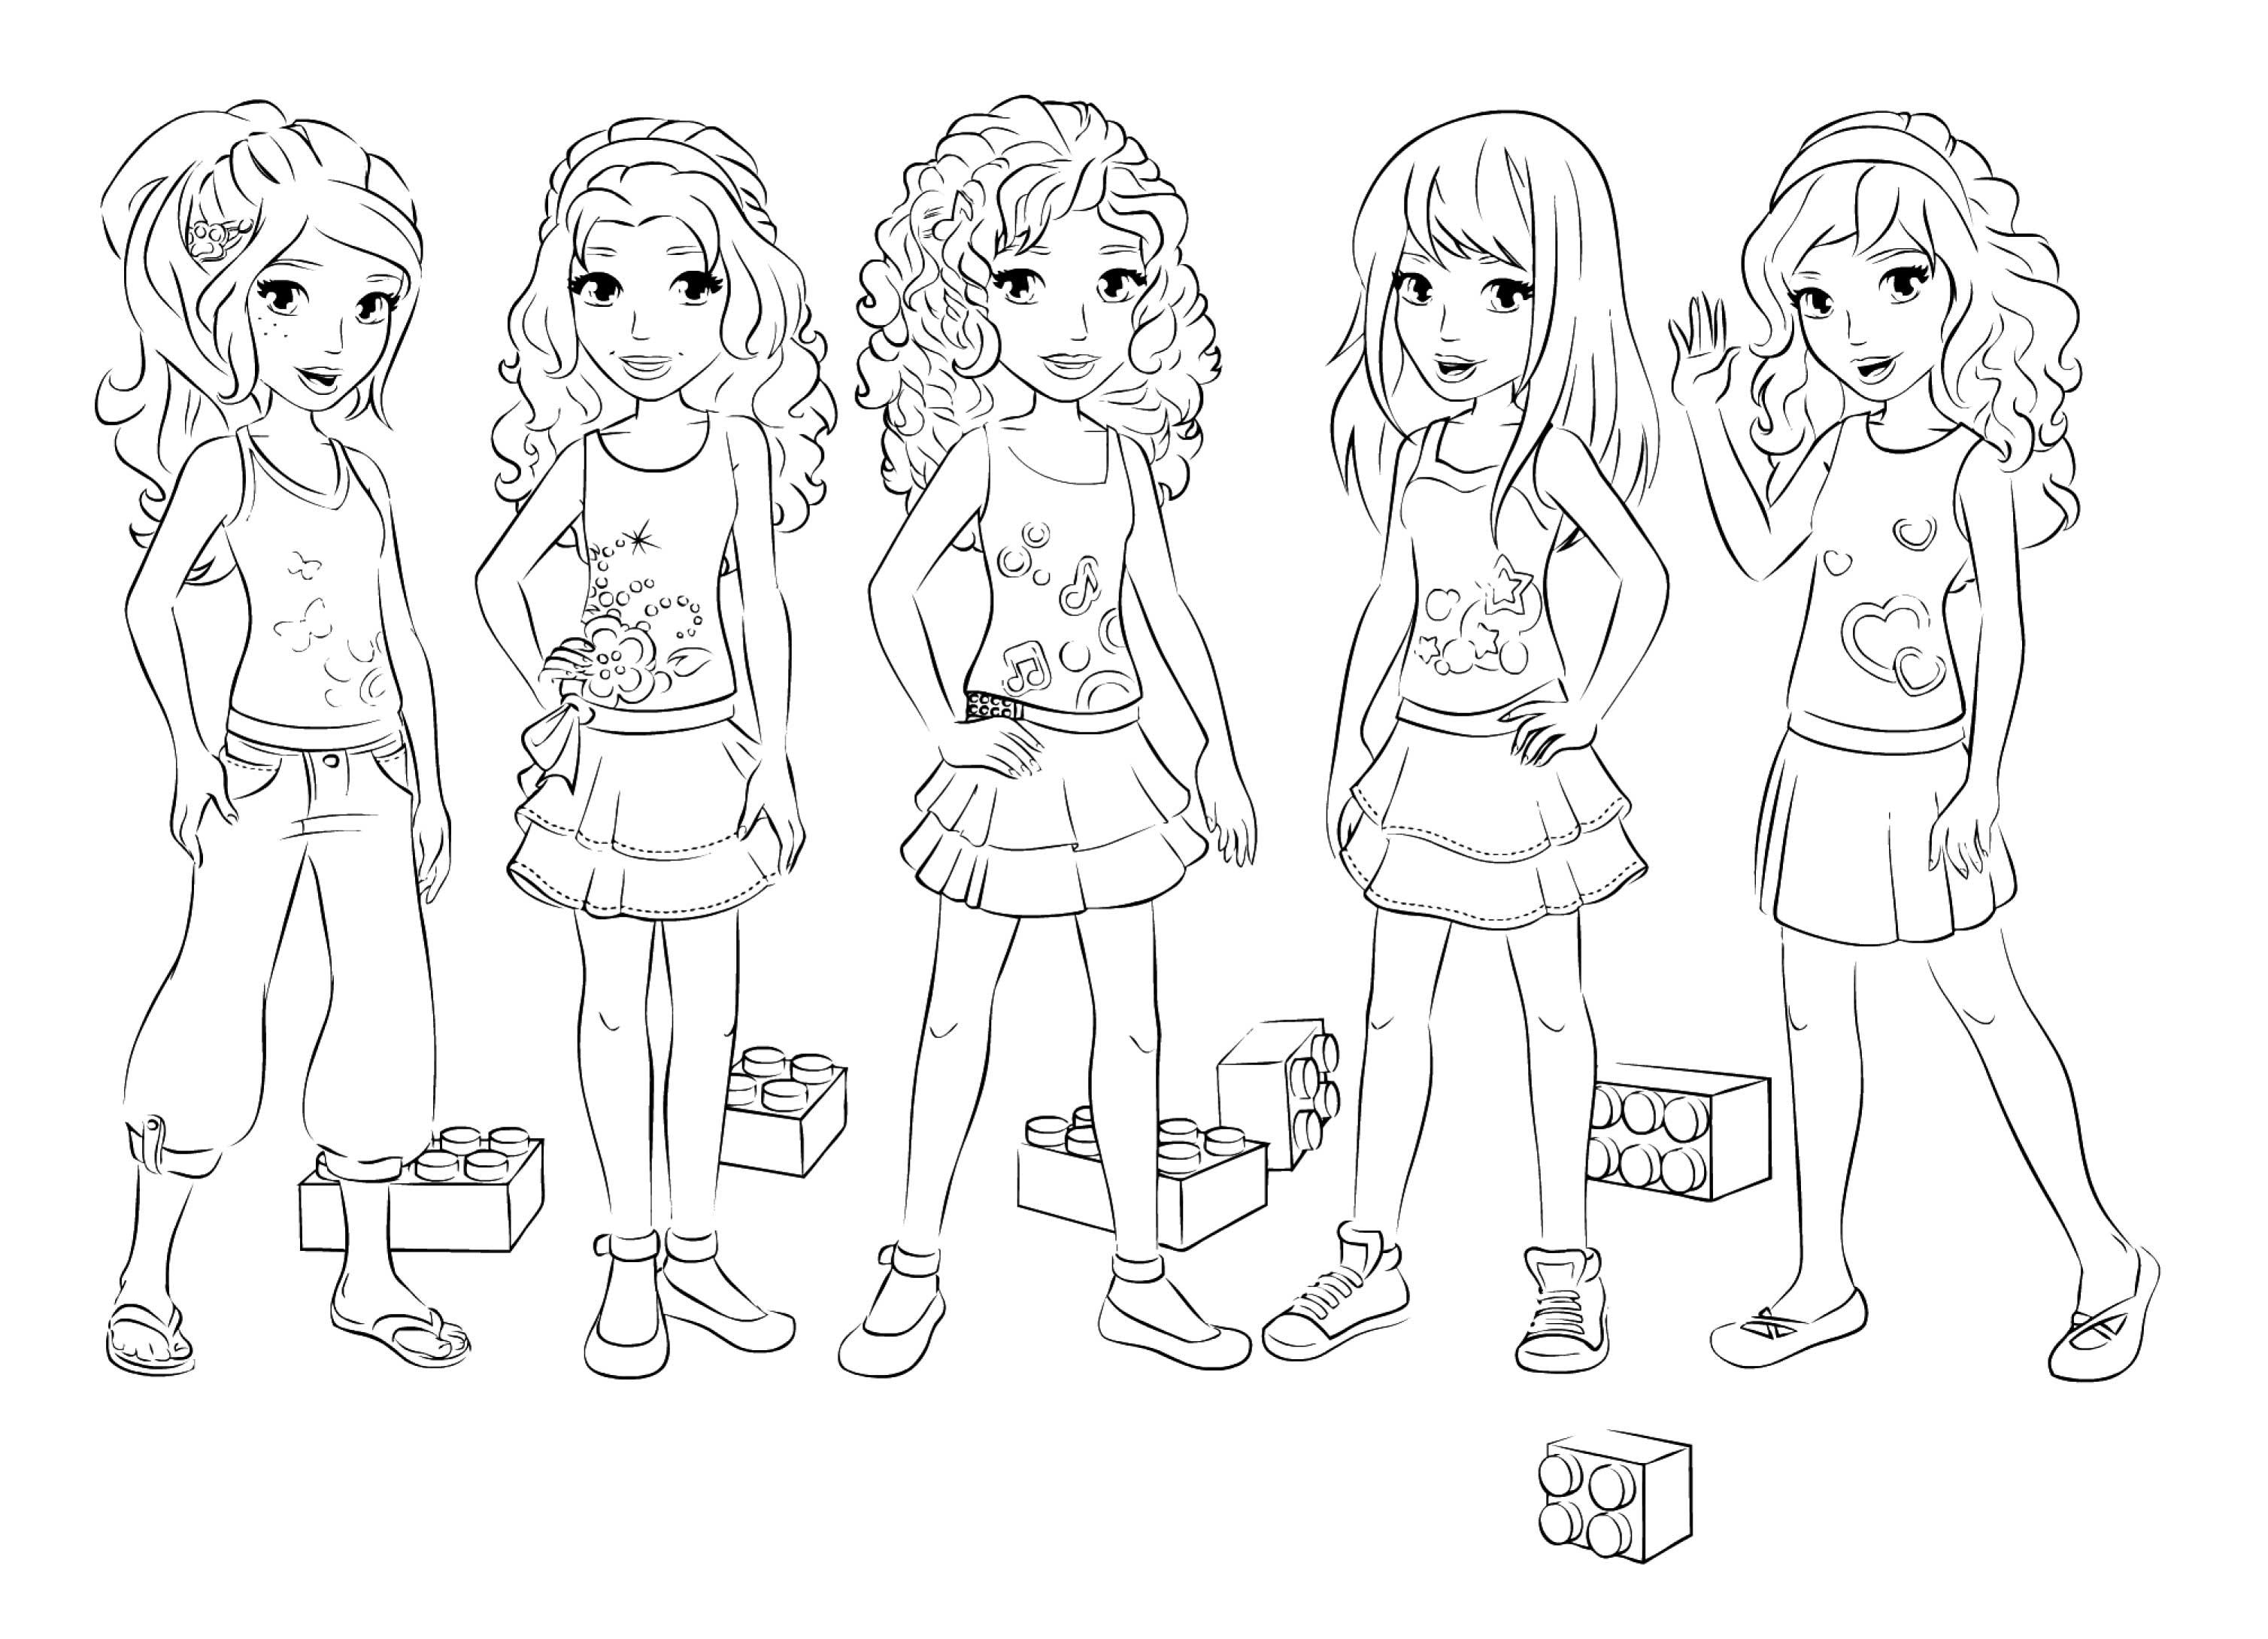 Image Of Dibujos Para Colorear Lego Friends Lego Friends dibujos ...